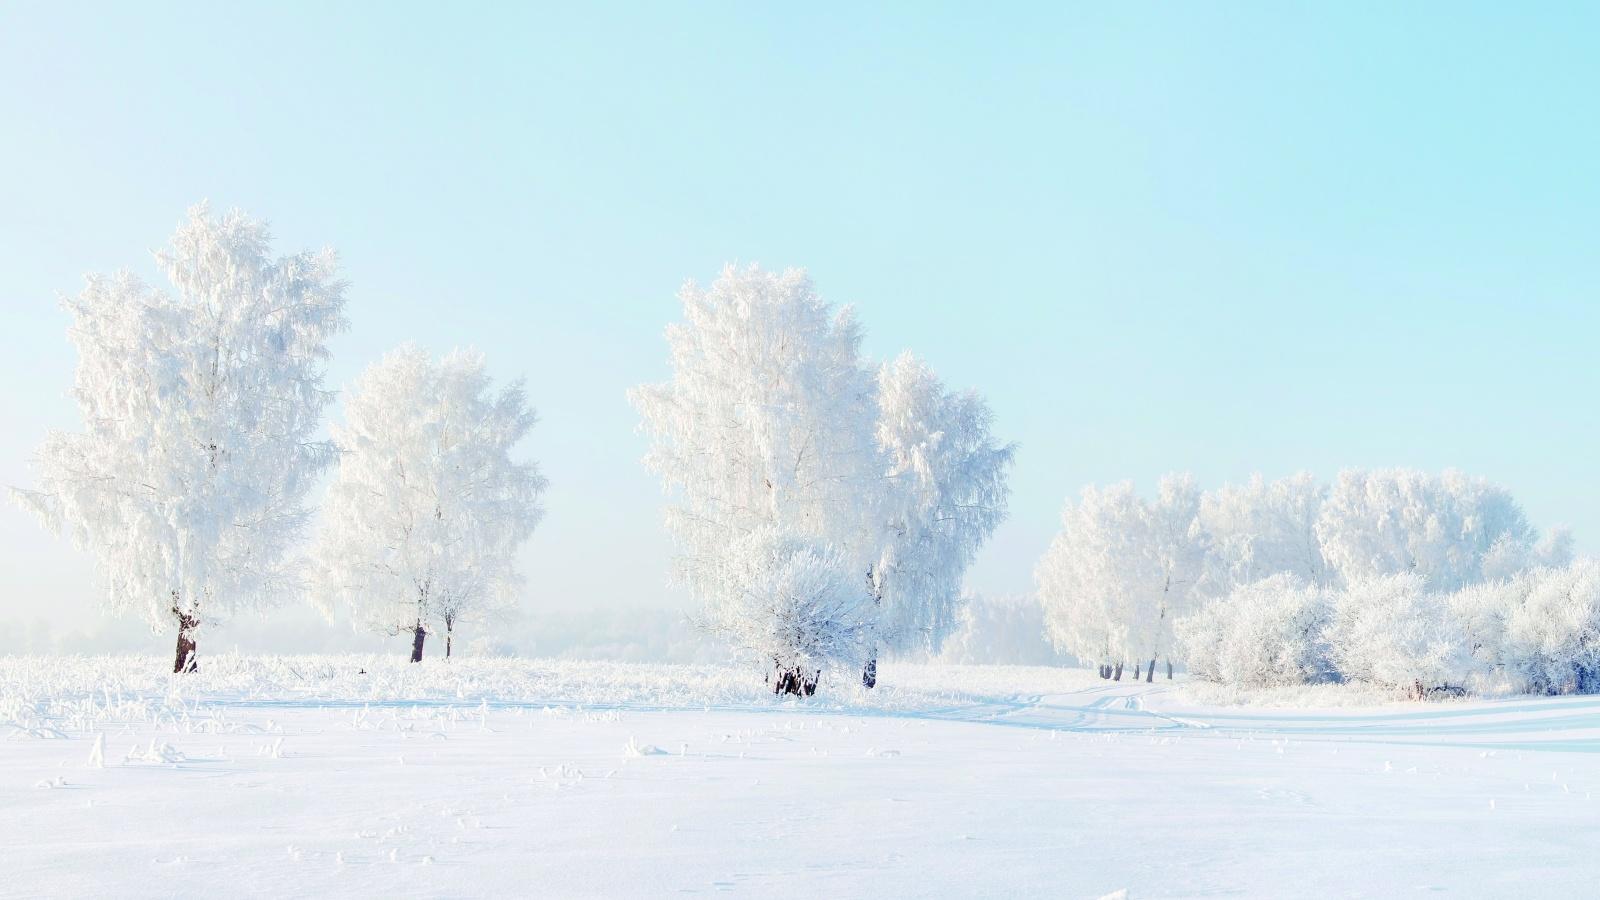 1600x900 hd desktop wallpaper winter - photo #40